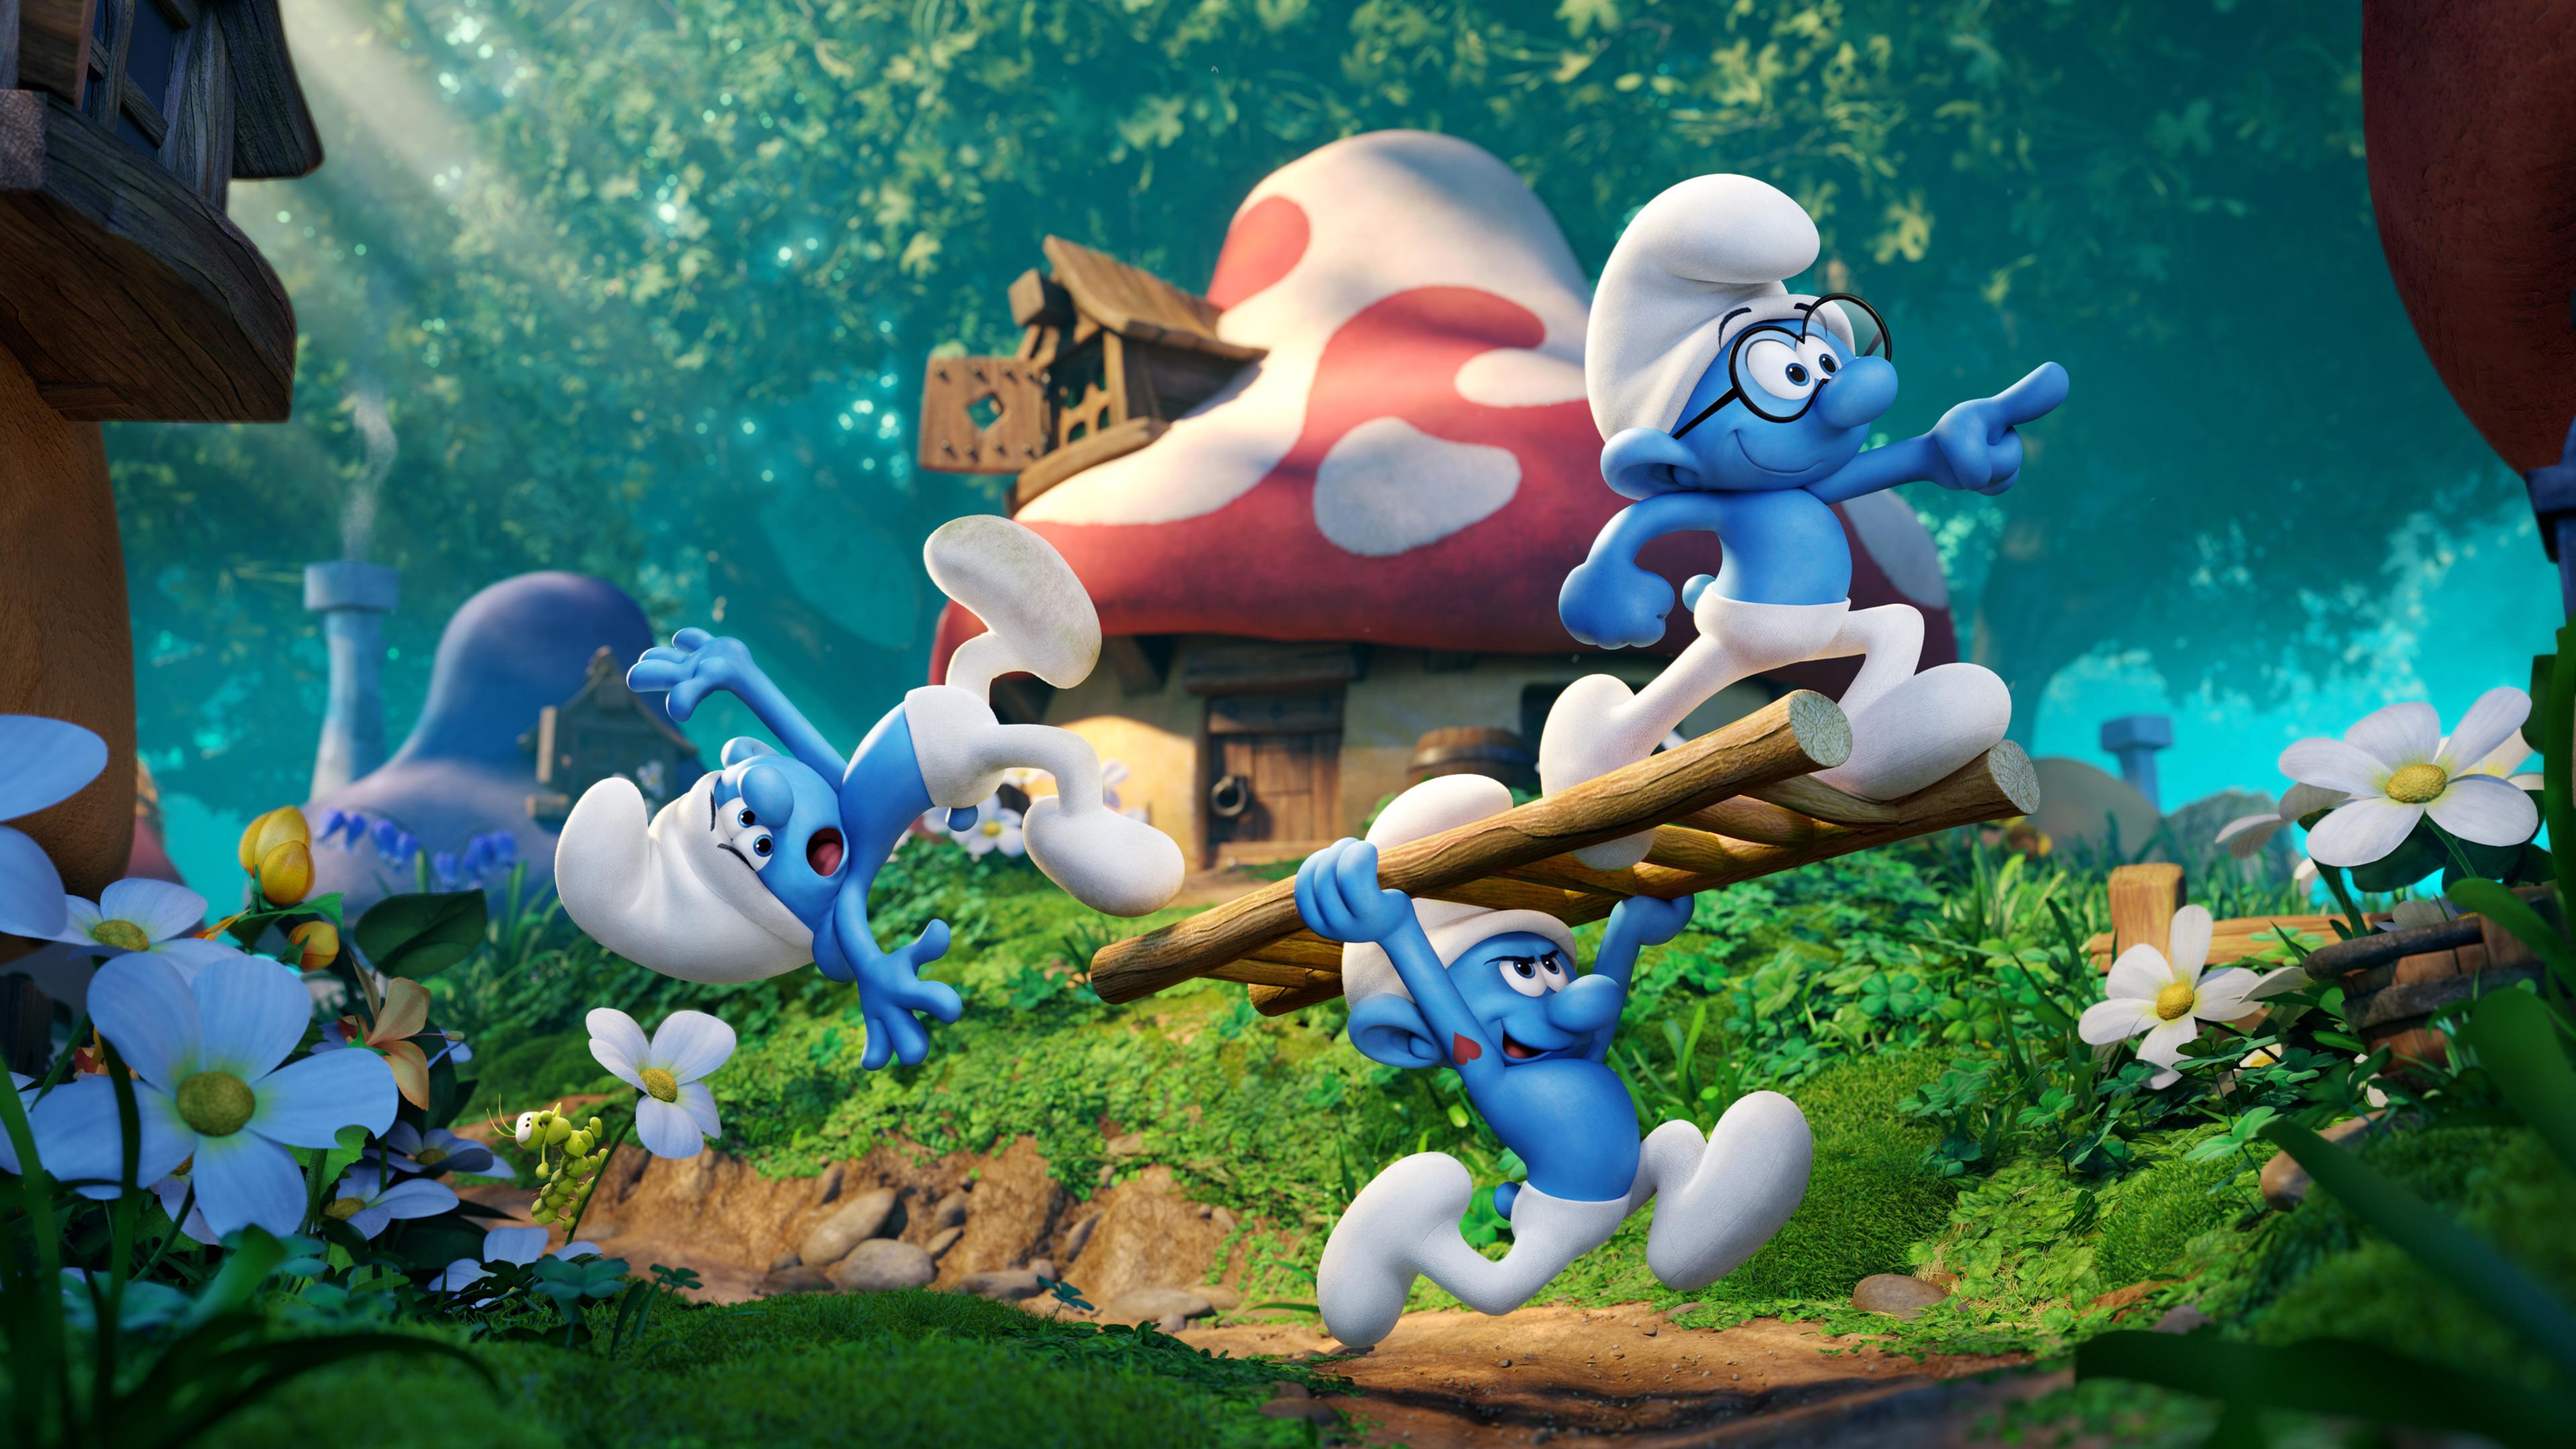 2017 smurfs the lost village 1536400201 - 2017 Smurfs The Lost Village - smurfs wallpapers, smurfs the lost village wallpapers, movies wallpapers, animated movies wallpapers, 4k-wallpapers, 2017 movies wallpapers